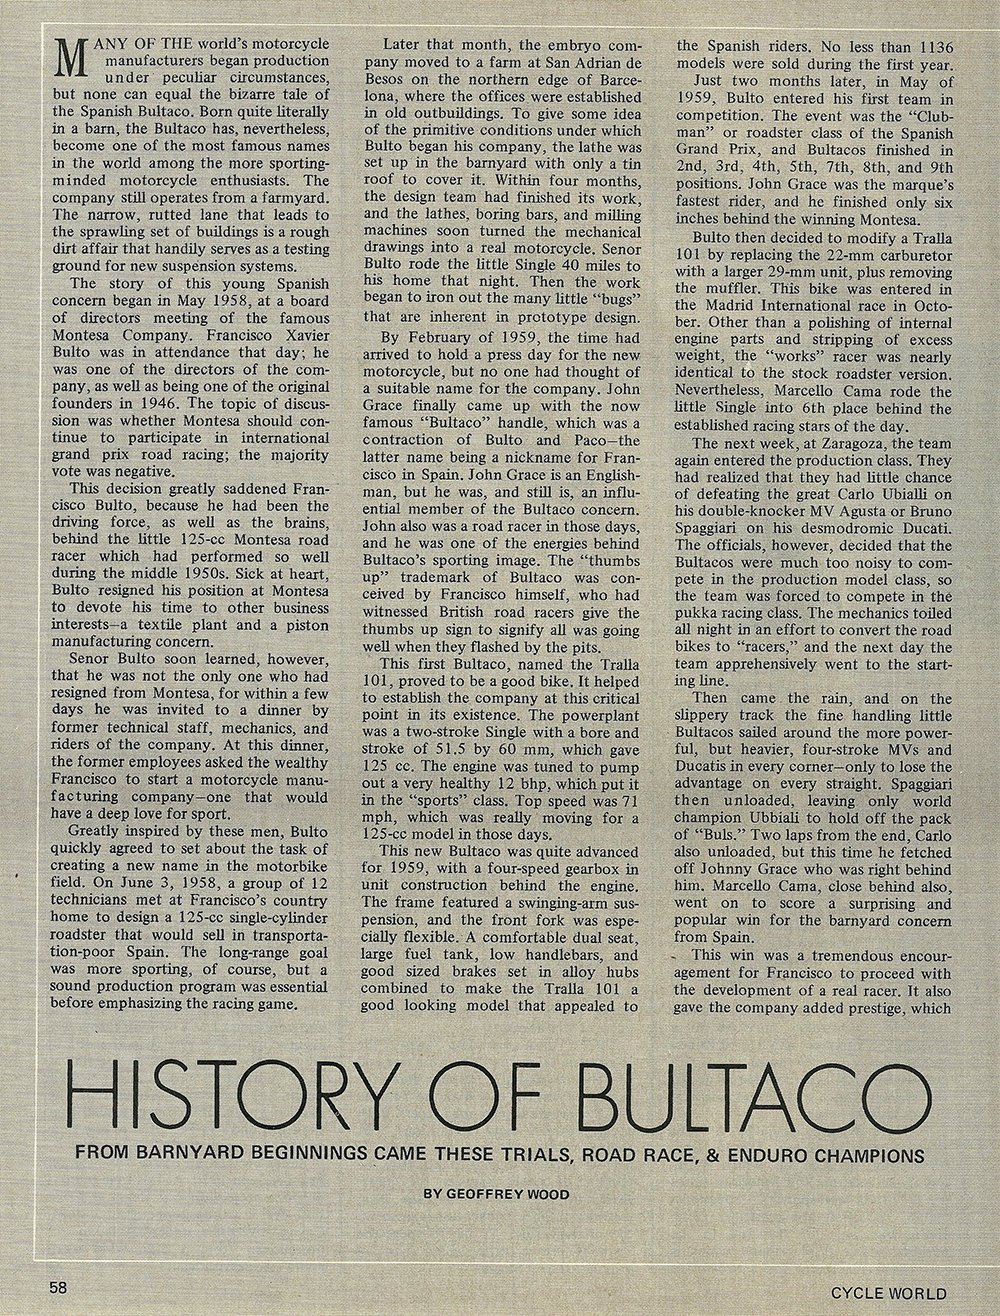 History of Bultaco 01.jpg